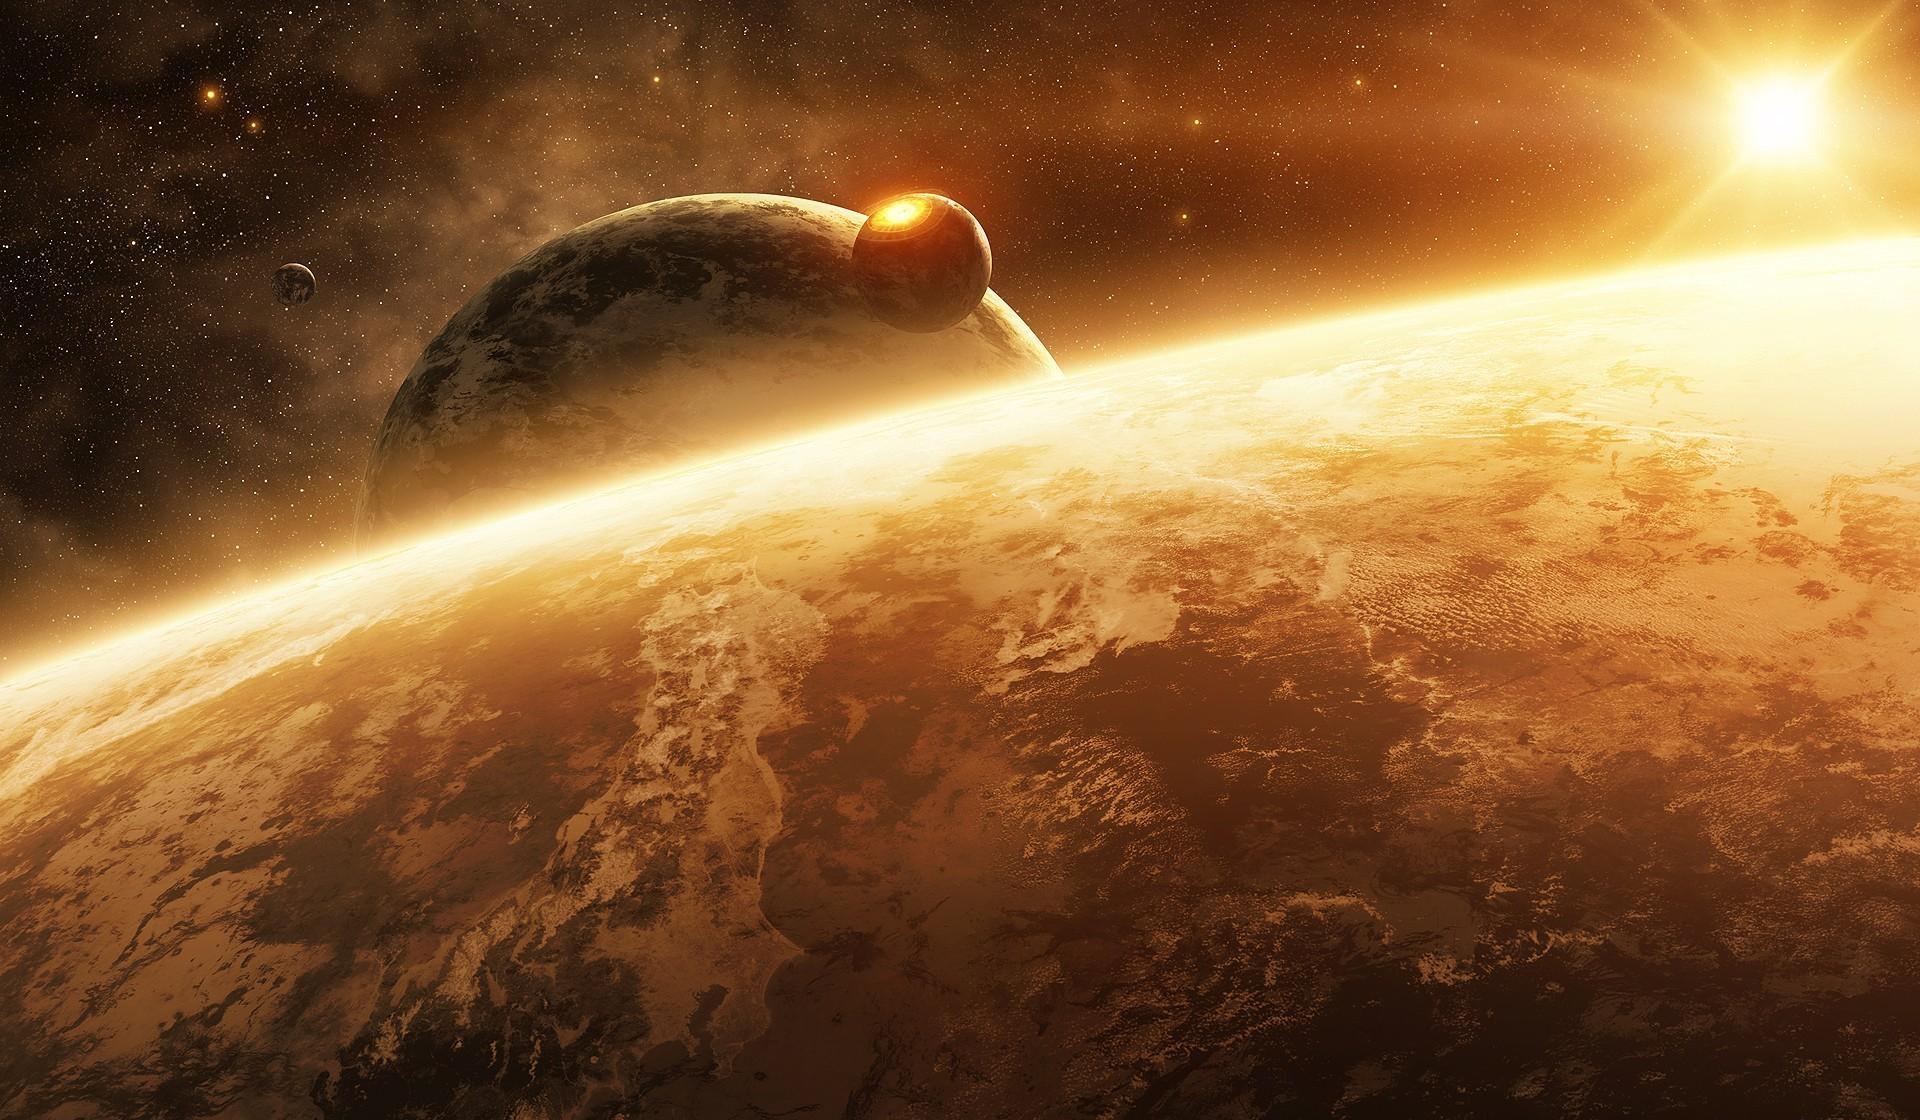 Download Galaxy Note 5 Galaxy S6 Edge Full Hd Stock: Planet, Space, Sun, Full HD Wallpaper